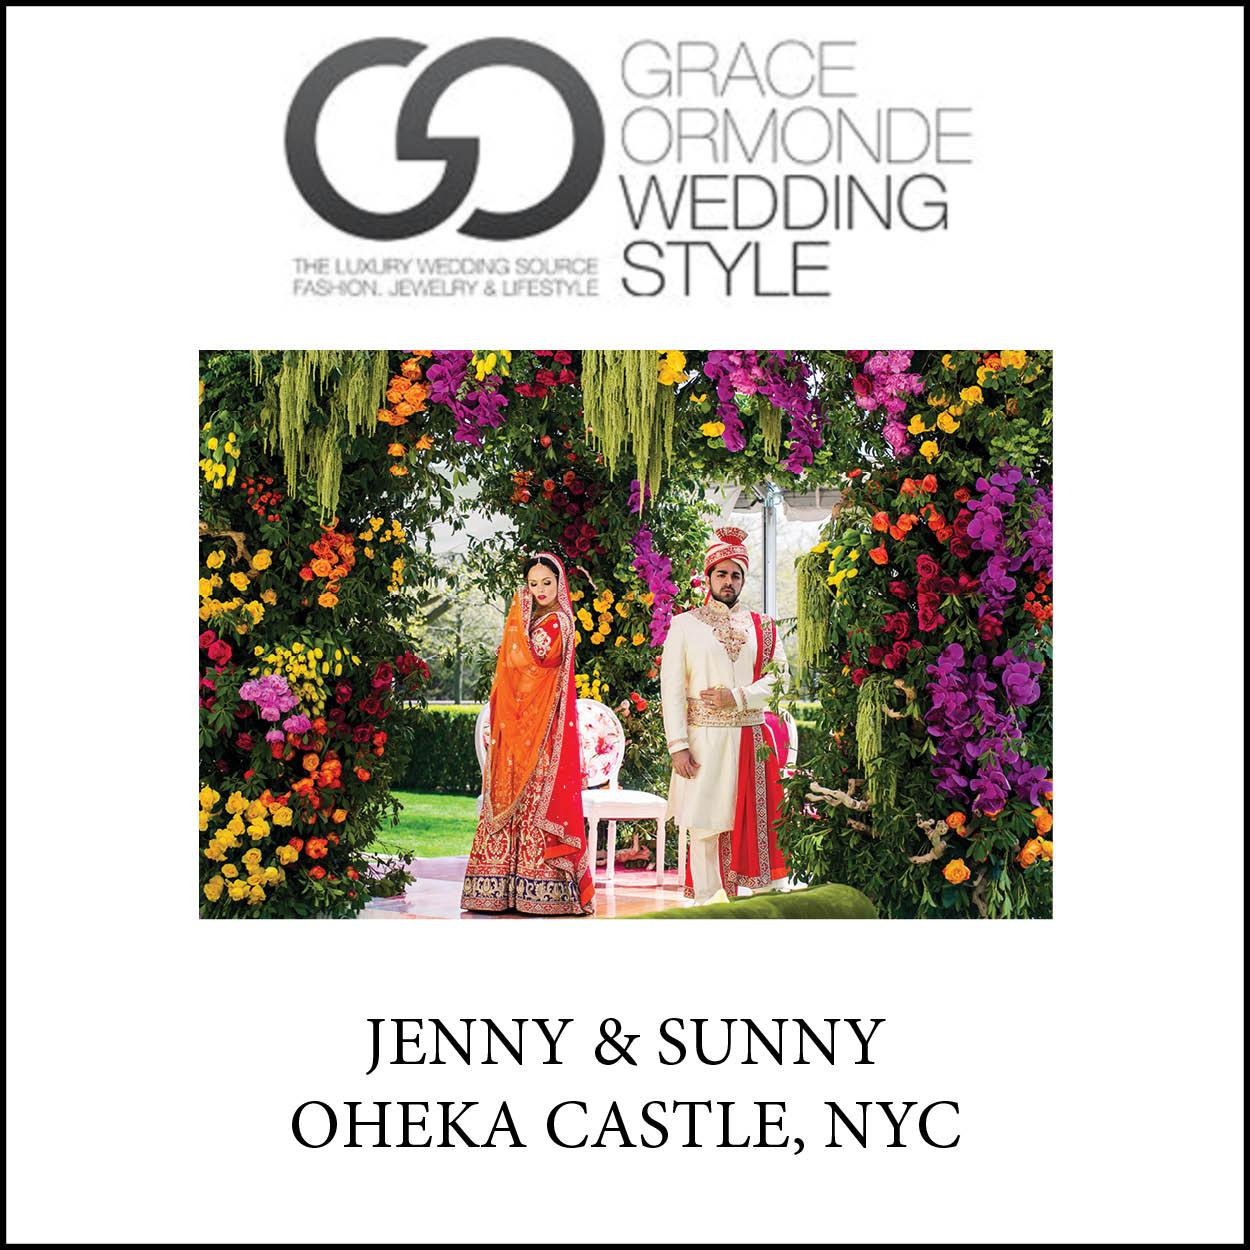 JENNY AND SUNNY TILE.jpg